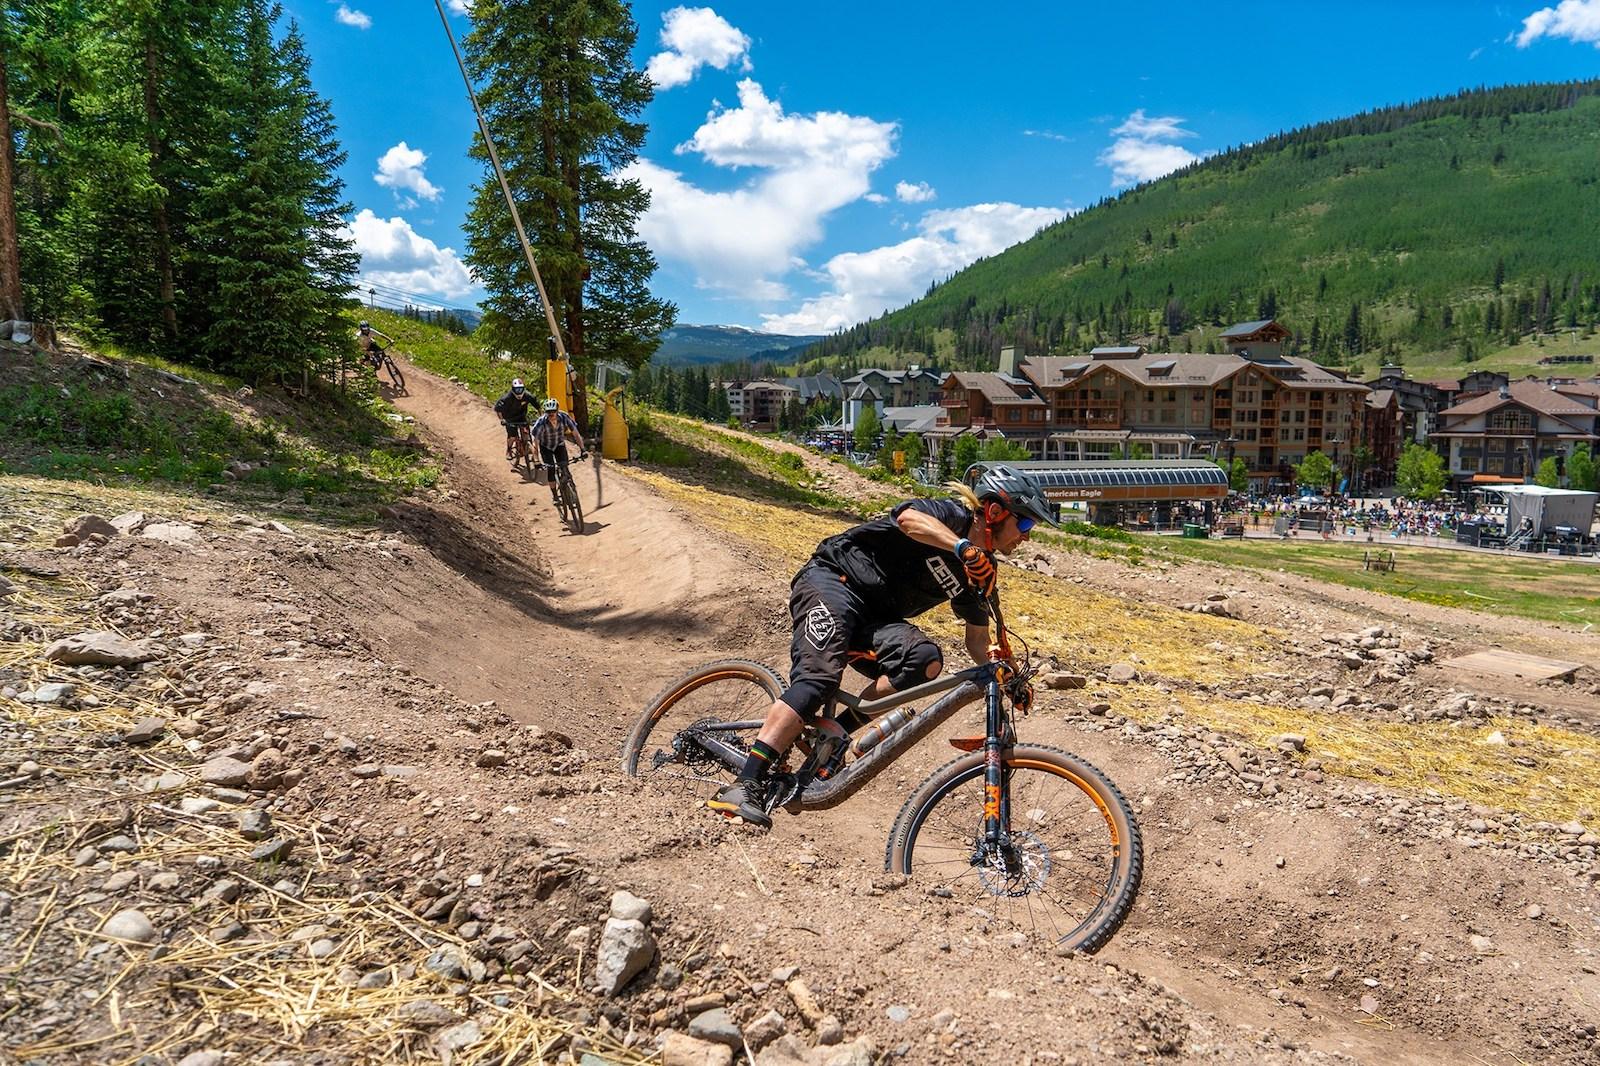 Gambar pengendara sepeda di Downhill Dukes di Copper Mountain, Colorado